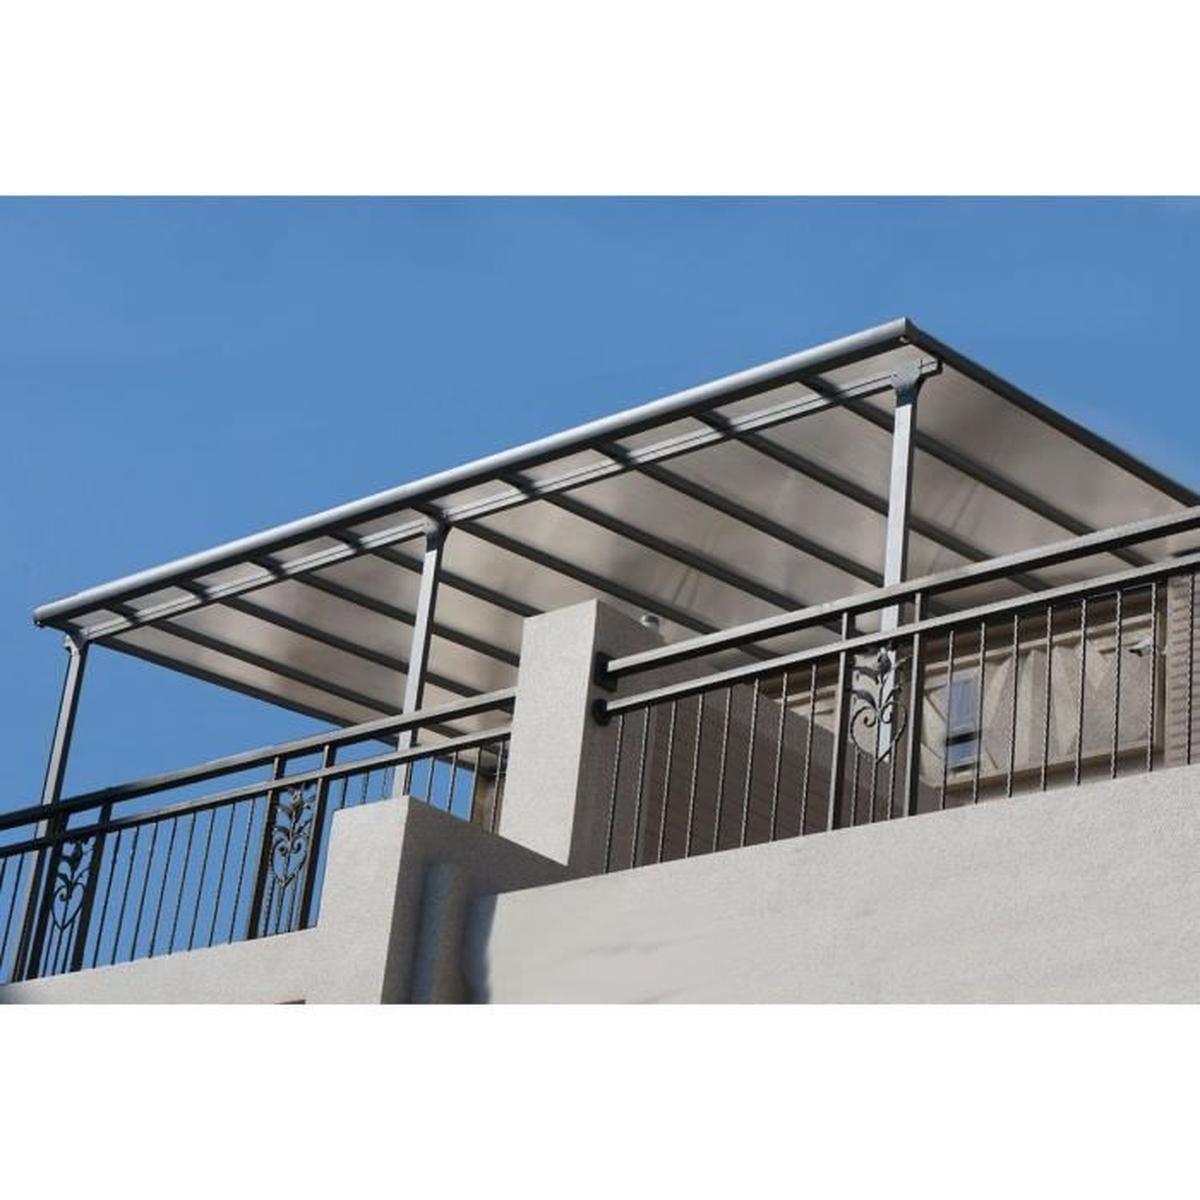 Carport Toit Terrasse Pergola 3X4 M En Aluminium - Achat ... encequiconcerne Toit Terrasse Aluminium